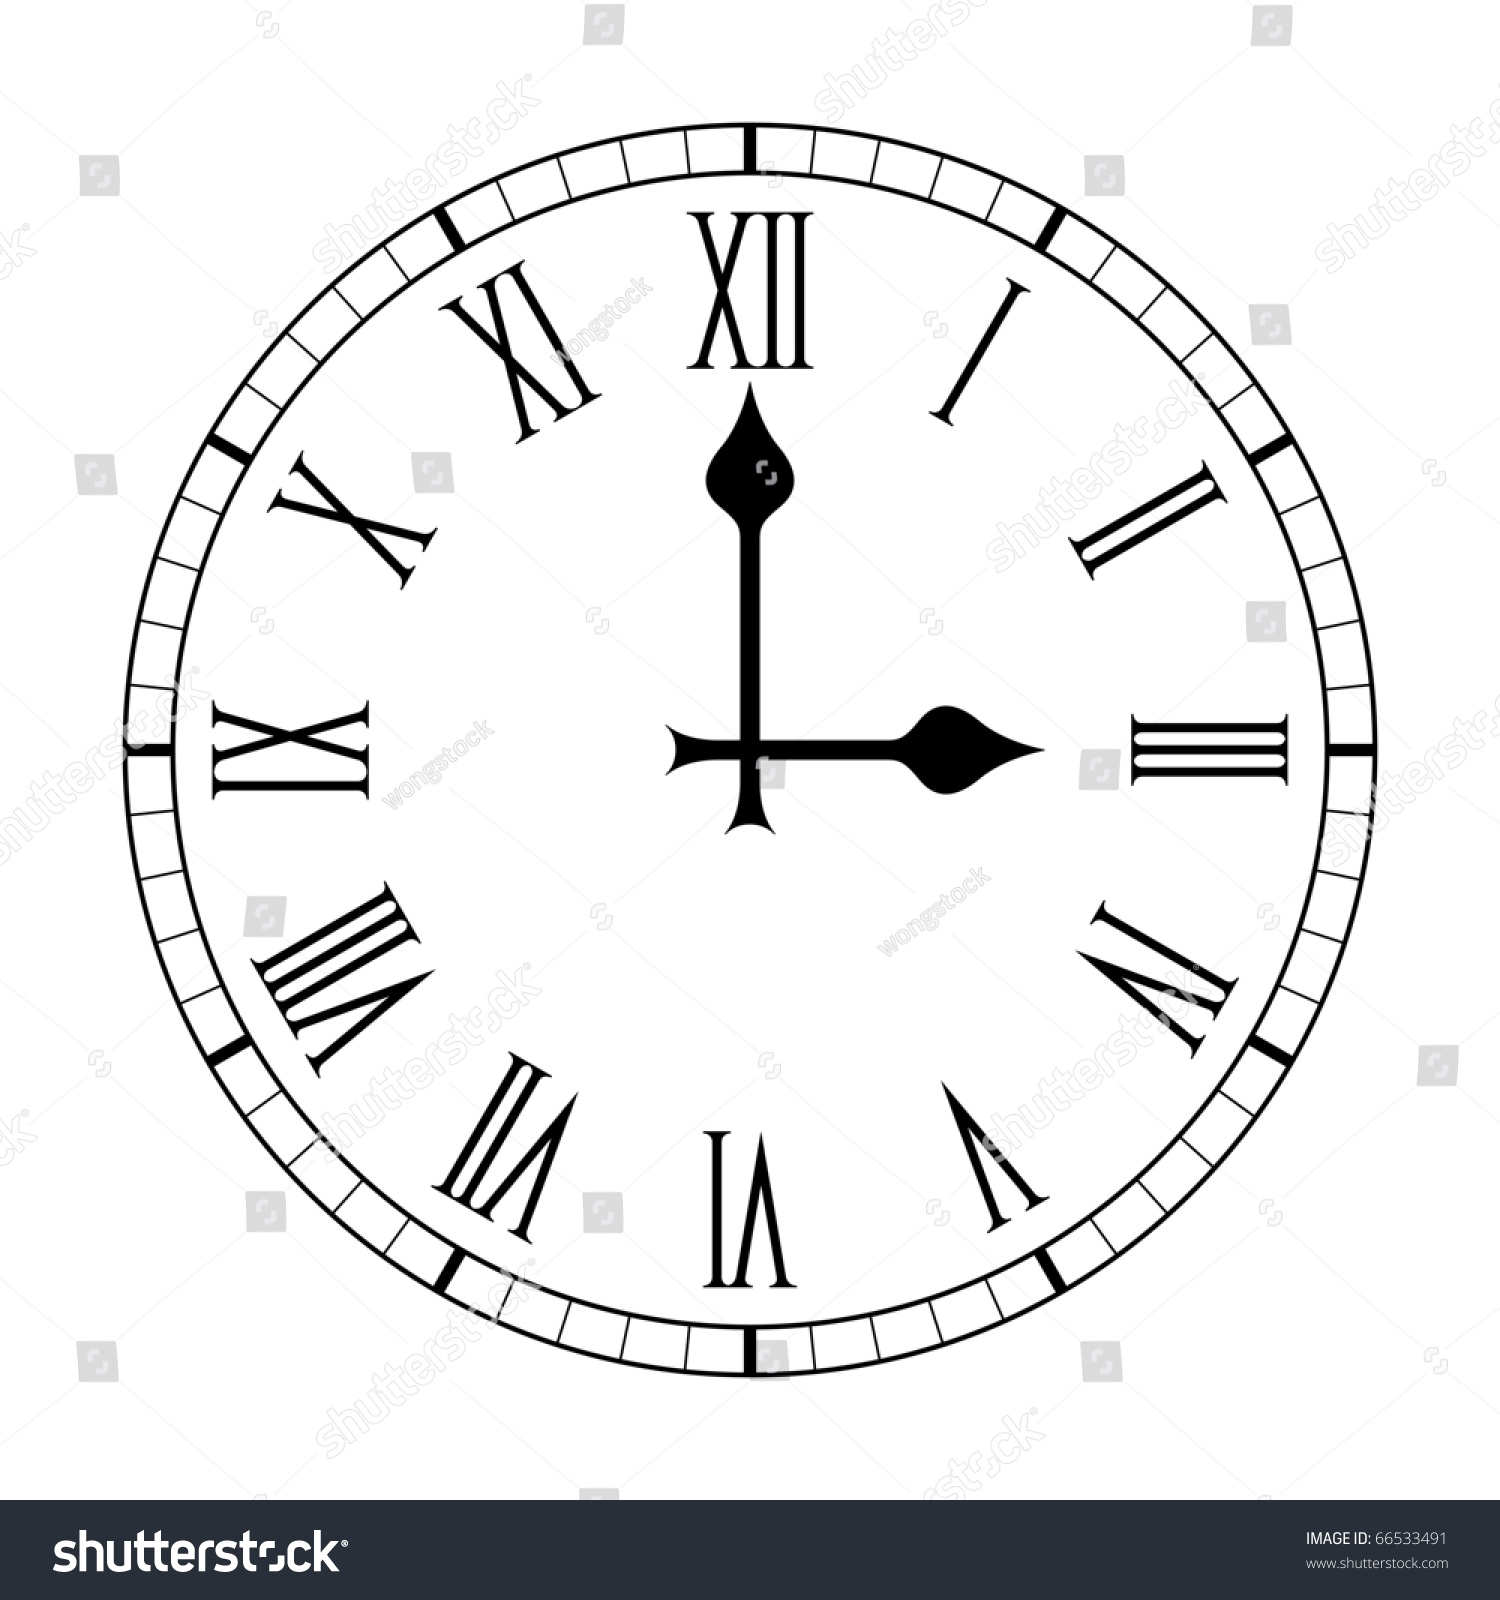 Worksheet Roman Numero plain roman numeral clock face stock vector 66533491 shutterstock face